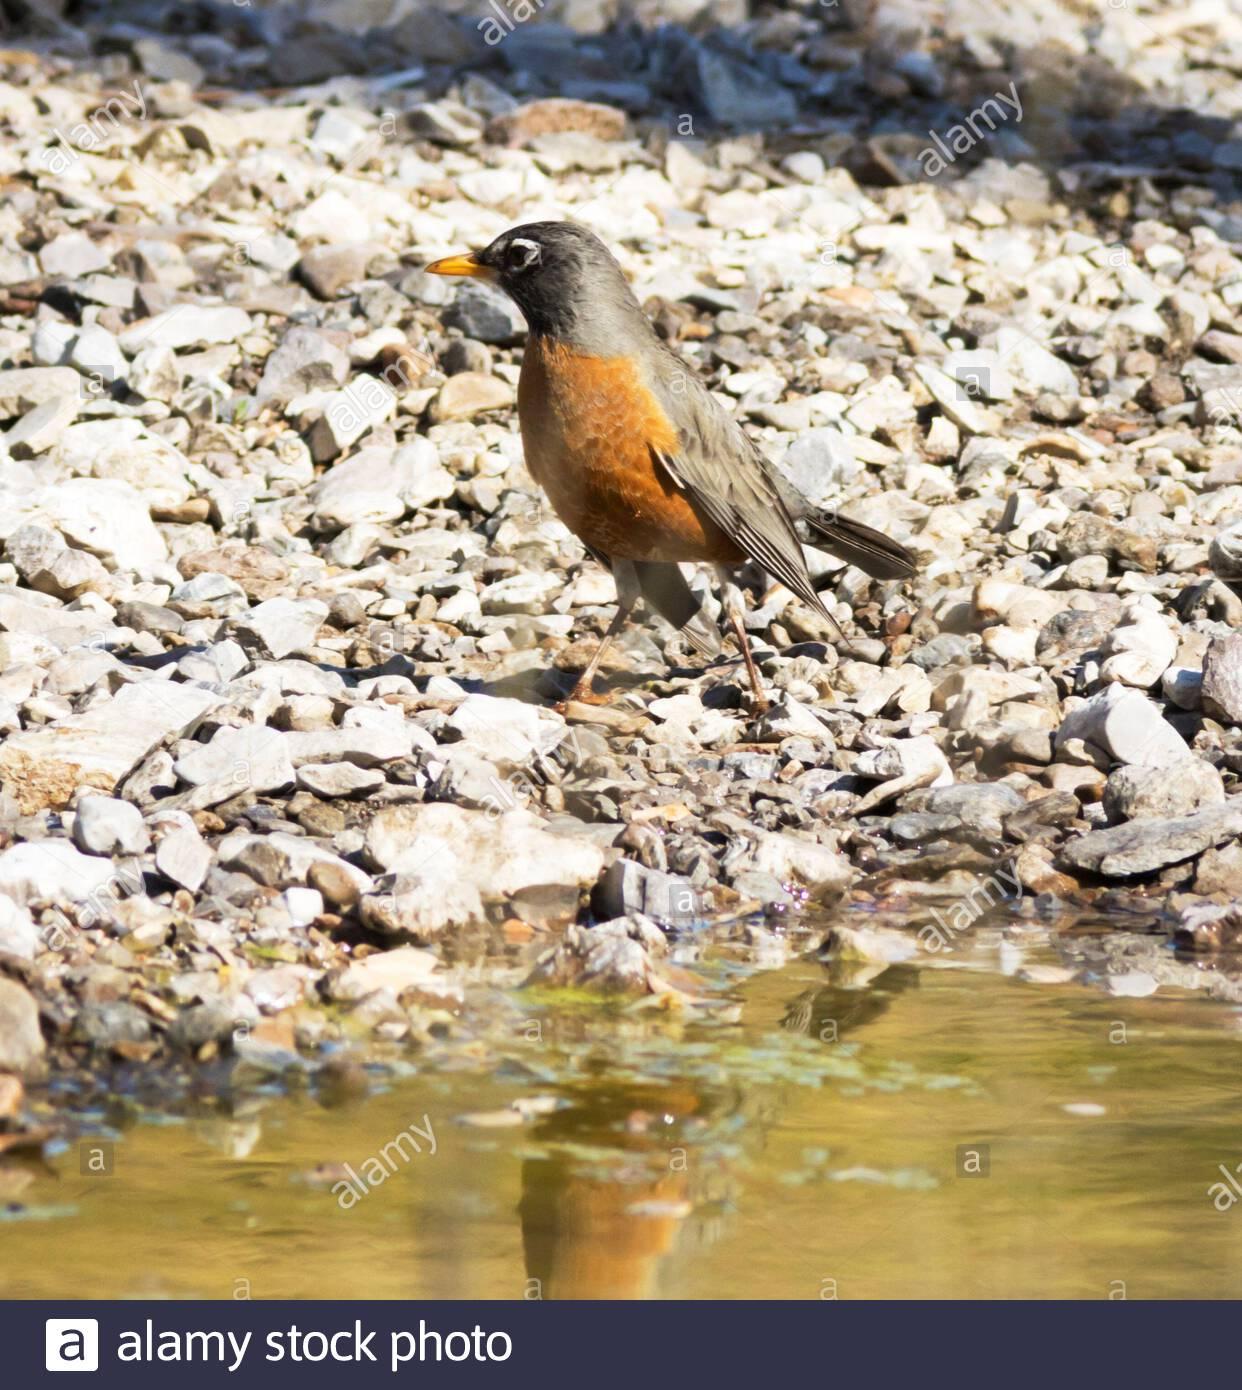 American Robin, Turdus migratorius, standing on rocks near creek in Arizona USA Stock Photo